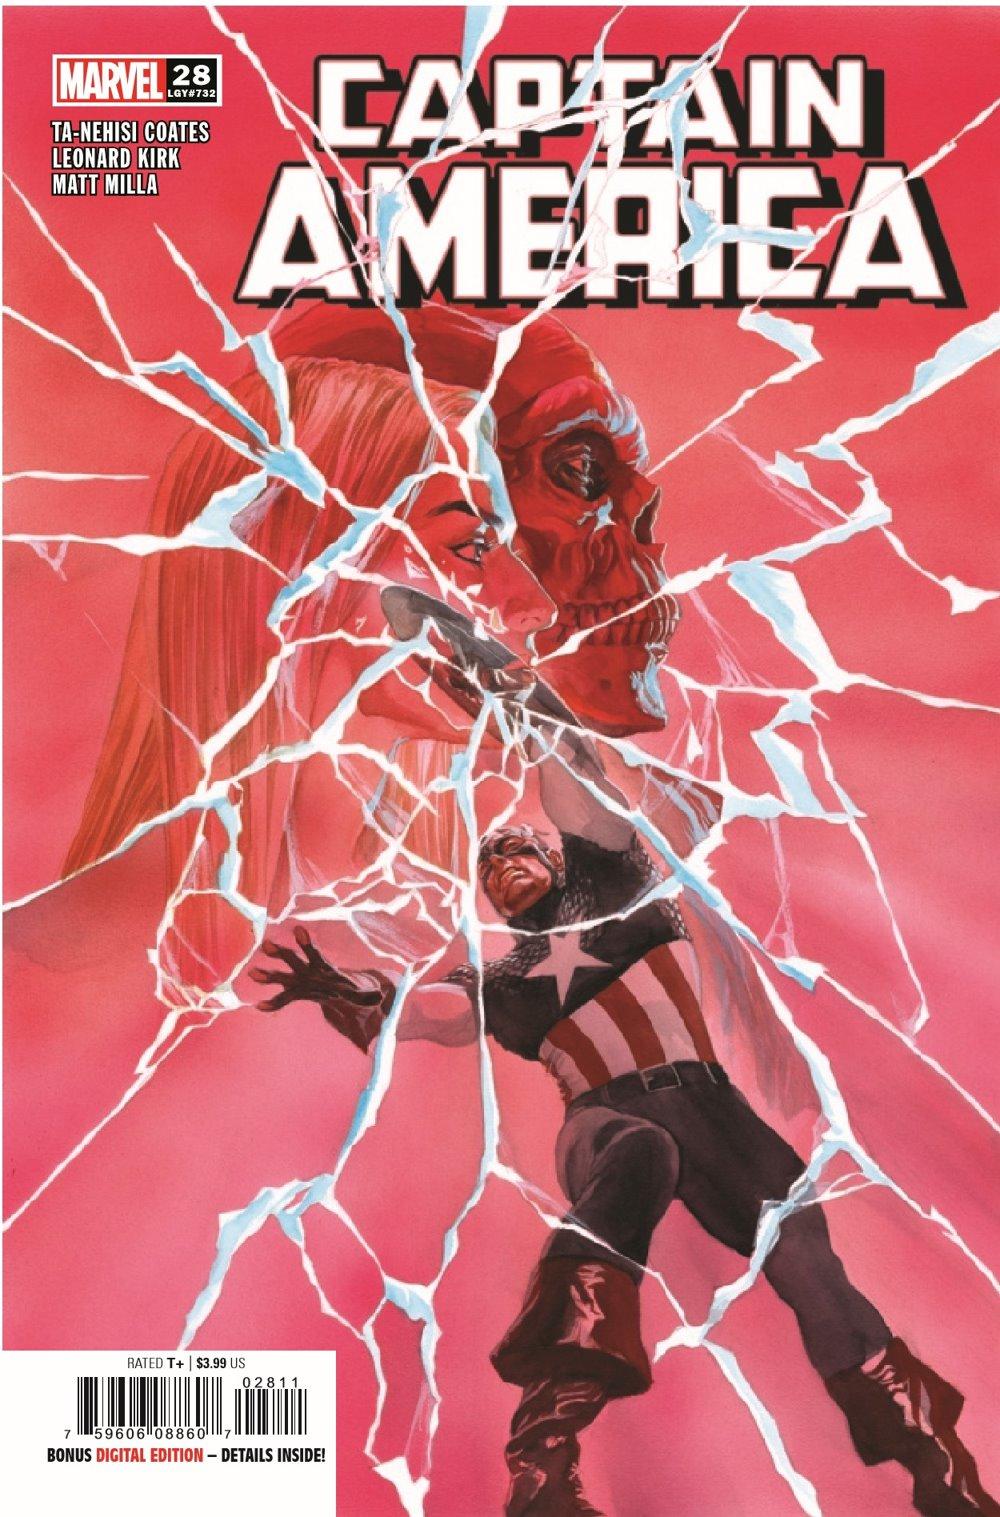 CAPA2018028_Preview-1 ComicList Previews: CAPTAIN AMERICA #28